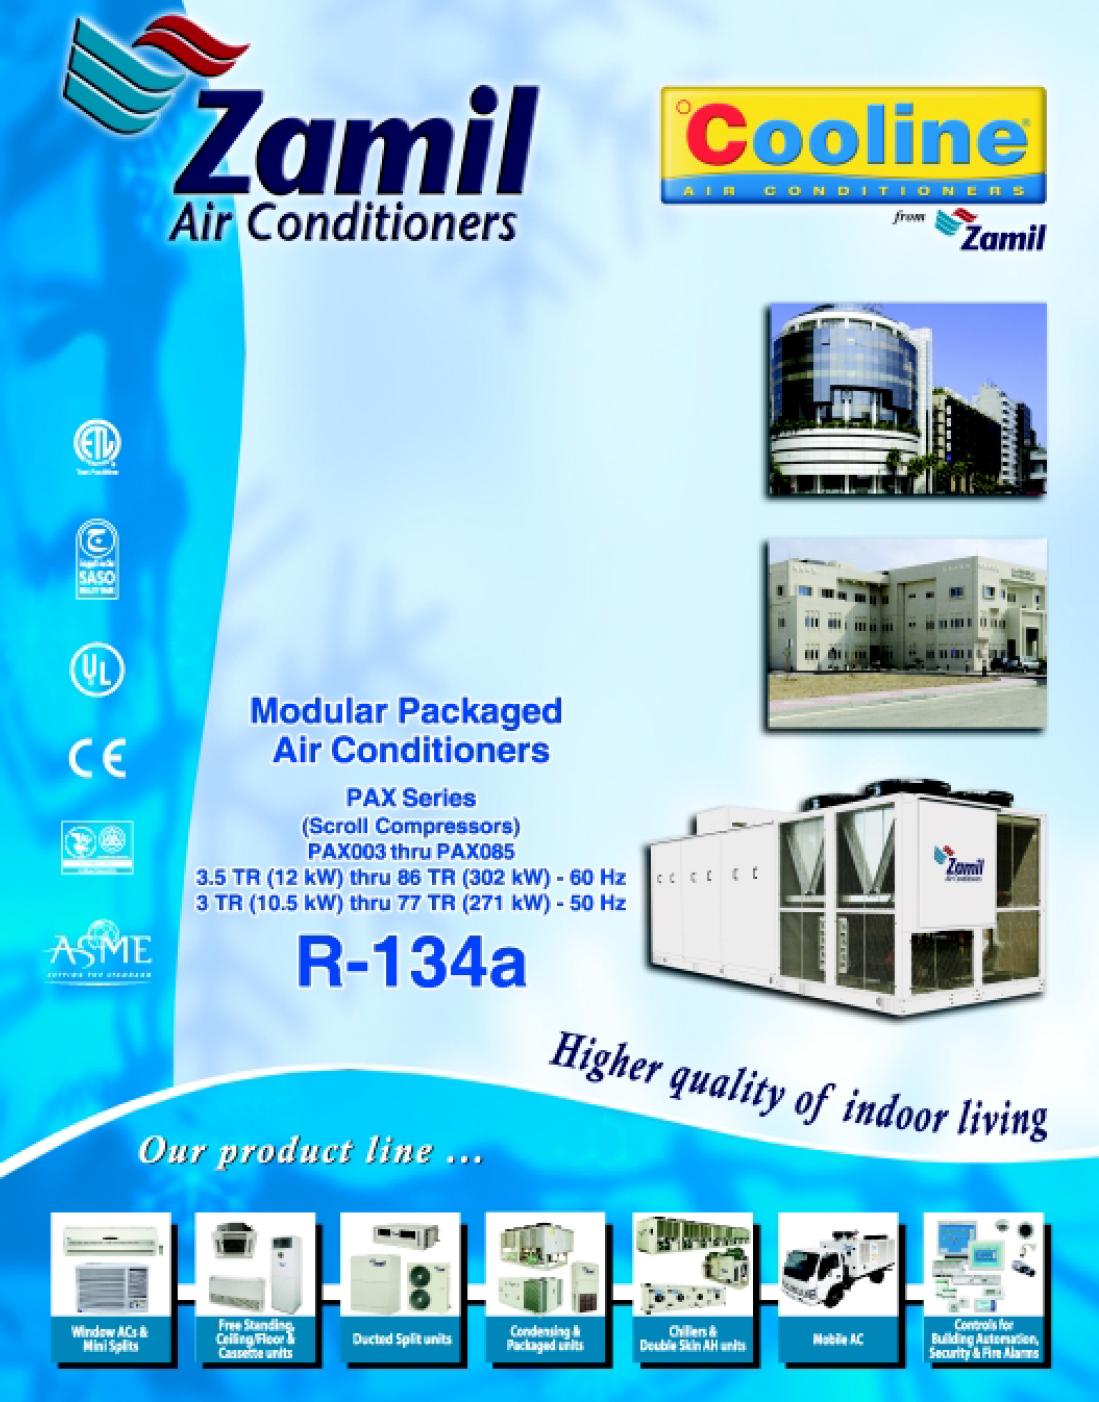 PRX series - Zamil Air Conditioners | manualzz com